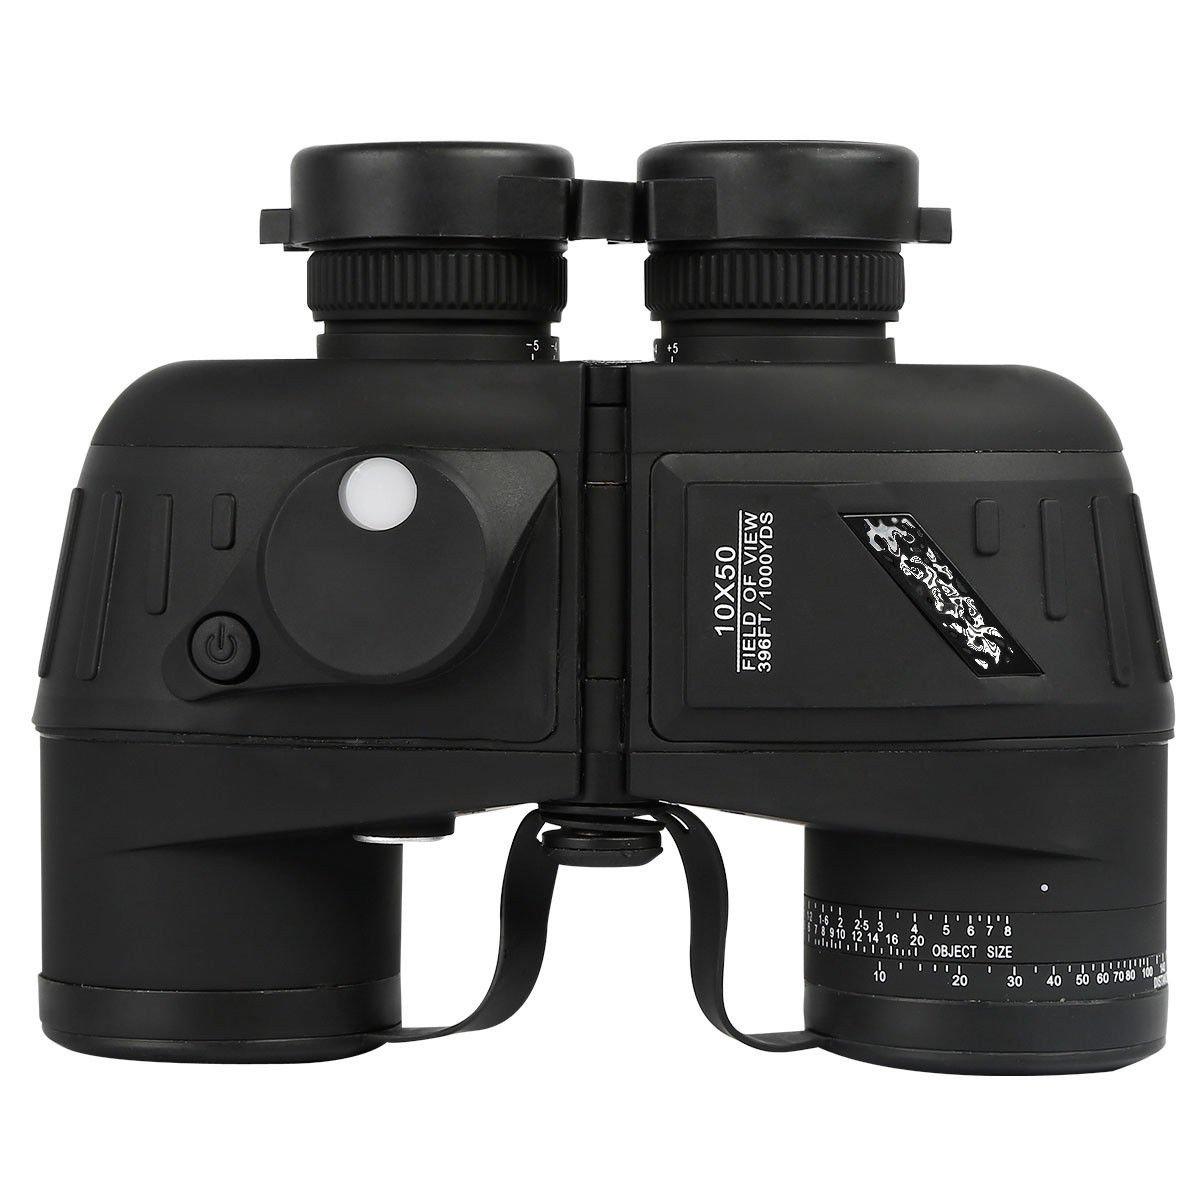 Tengchang 10X50 Military Marine Night Vision Binoculars with Rangefinder Compass by Tengchang